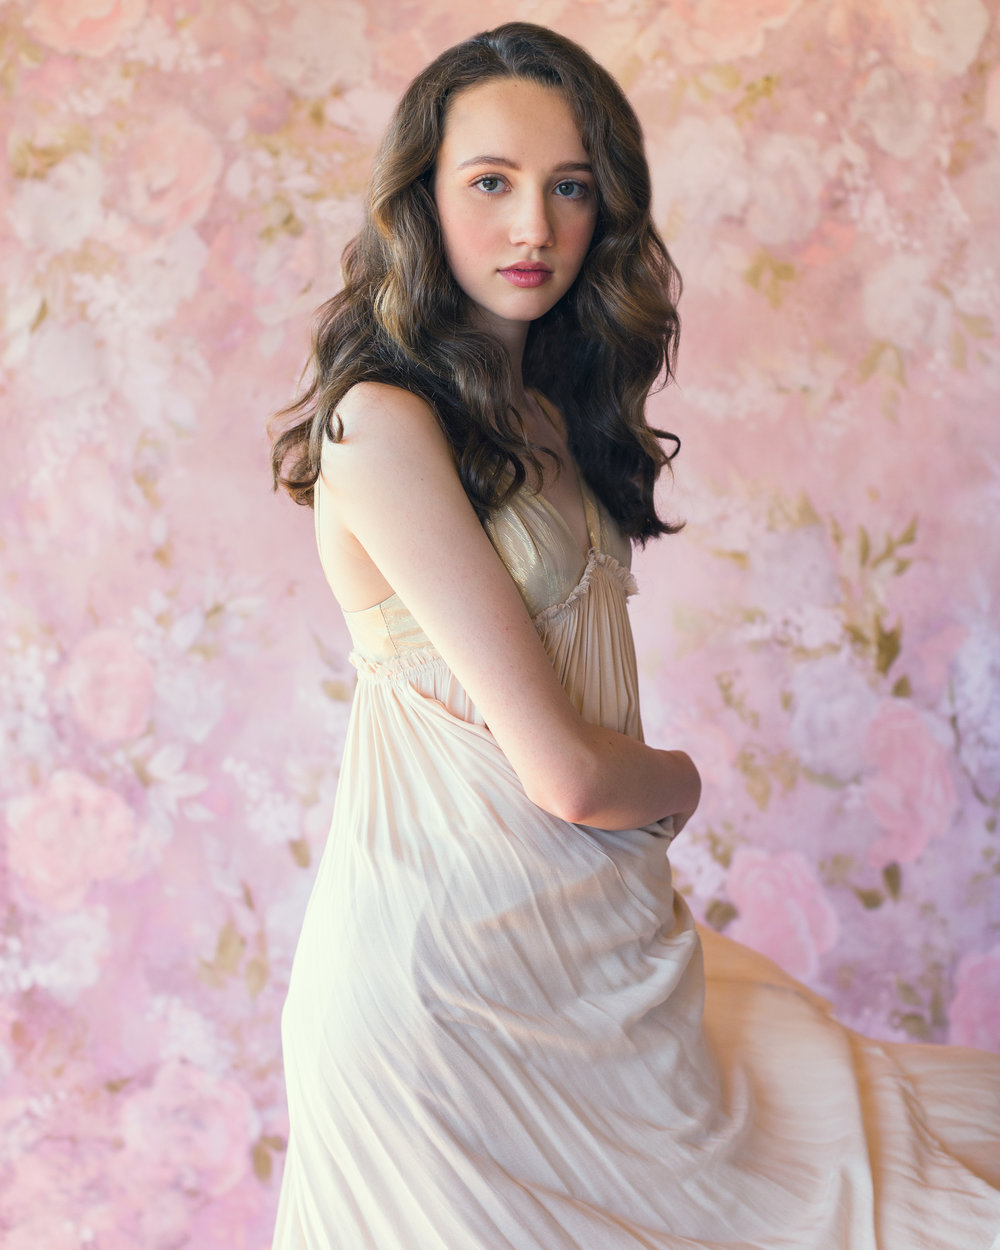 Teen_Portrait_Claudine_Williams 2.jpg